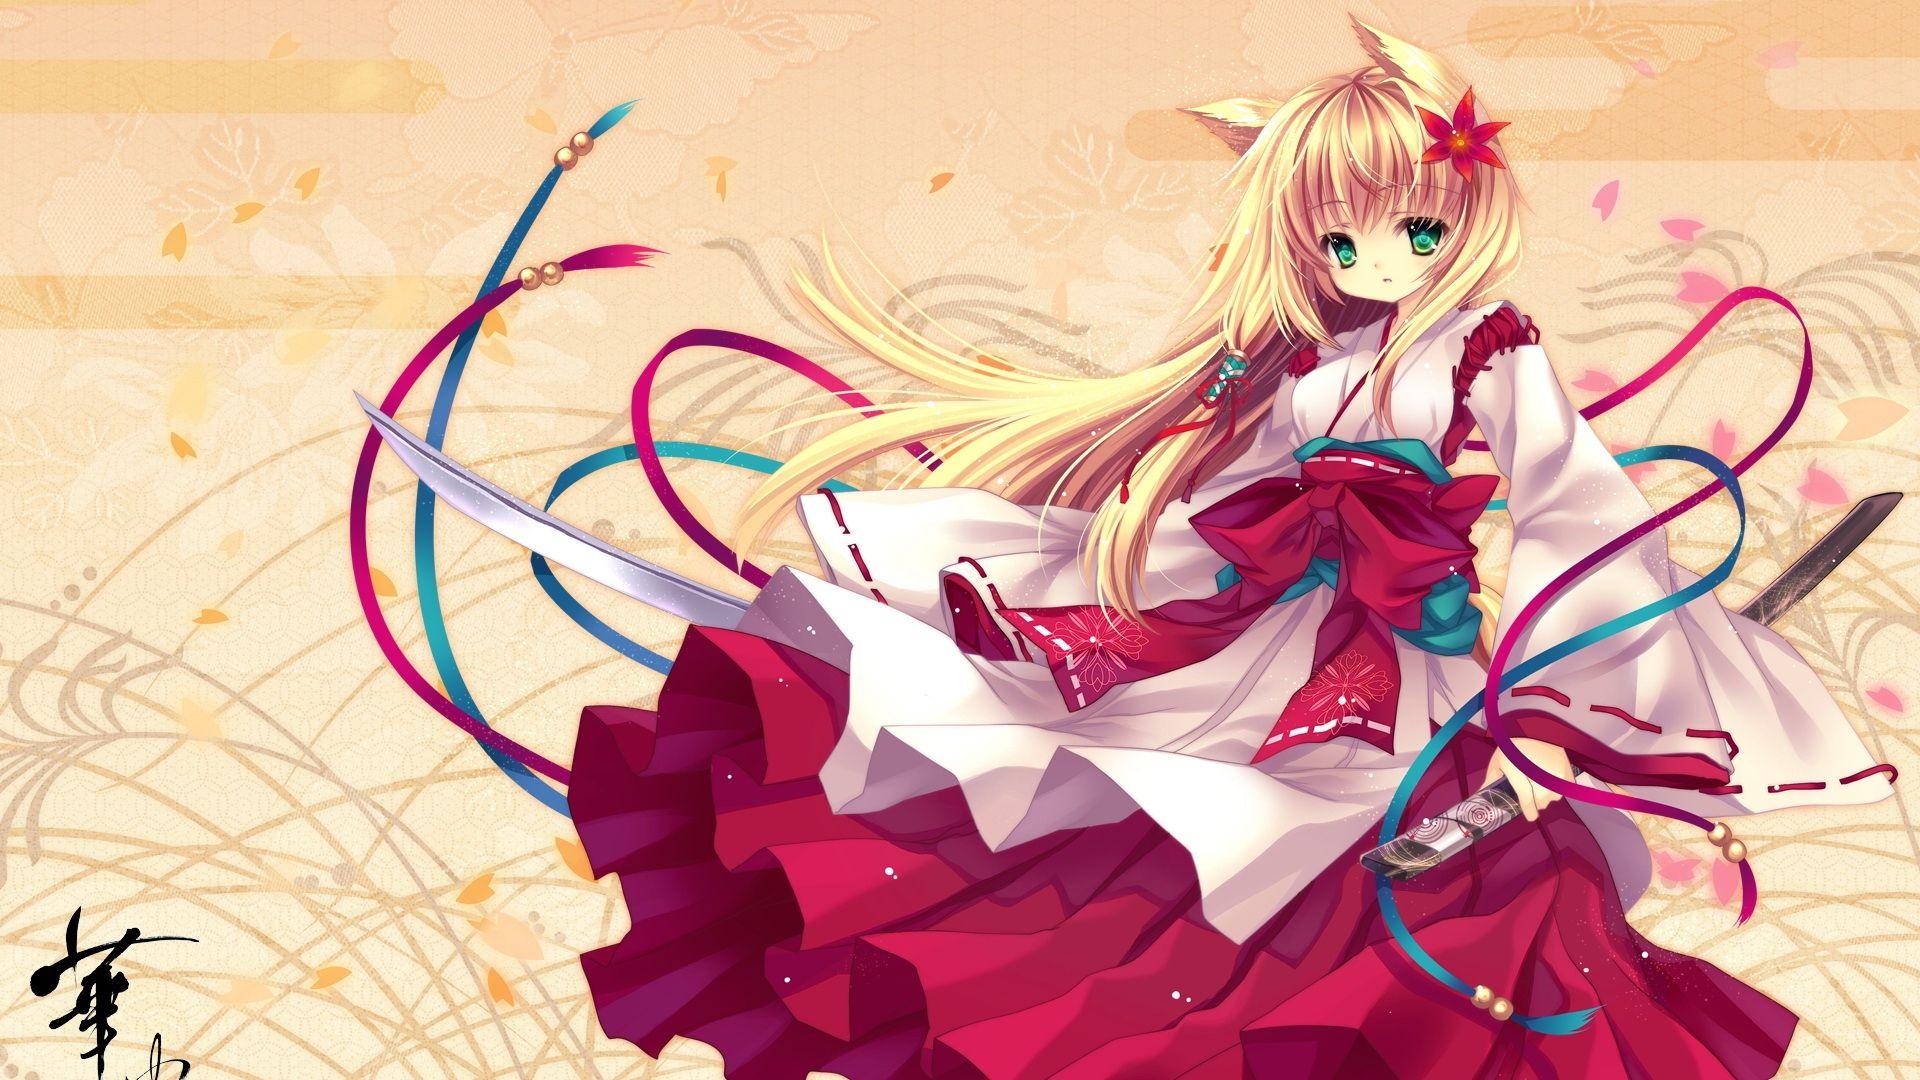 Full HD 1080p Neko girls Wallpapers HD, Desktop